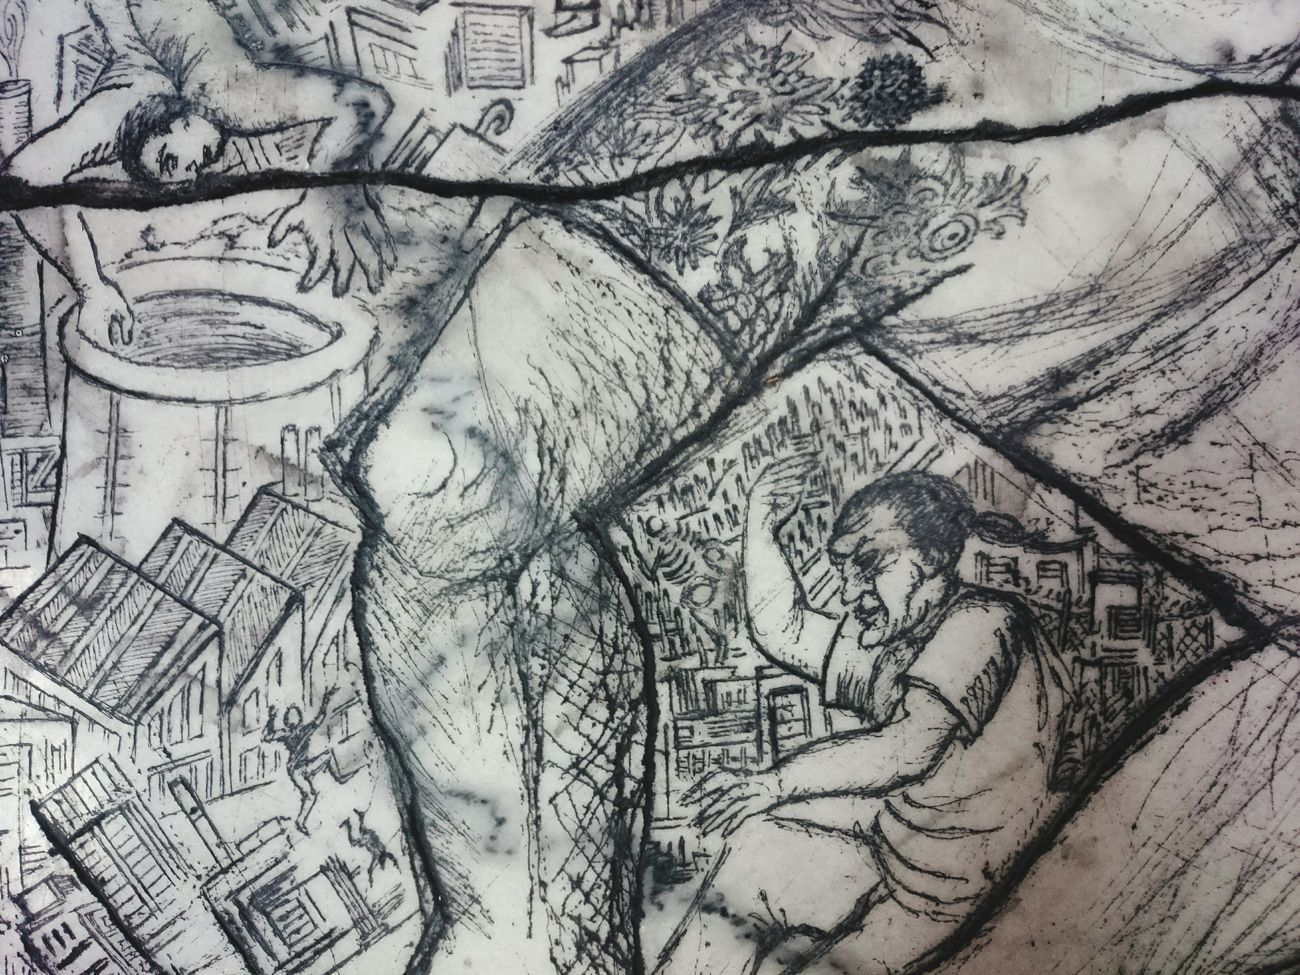 Marble Streetart #street #streetphotography #tagsforlikes #sprayart #urban #urbanart #urbanwalls #wall #wallporn #graffitiigers #stencilart #art #graffiti #instagraffiti #instagood #artwork #mural #graffitiporn #photooftheday #stencil #streetartistry Photograp Carving